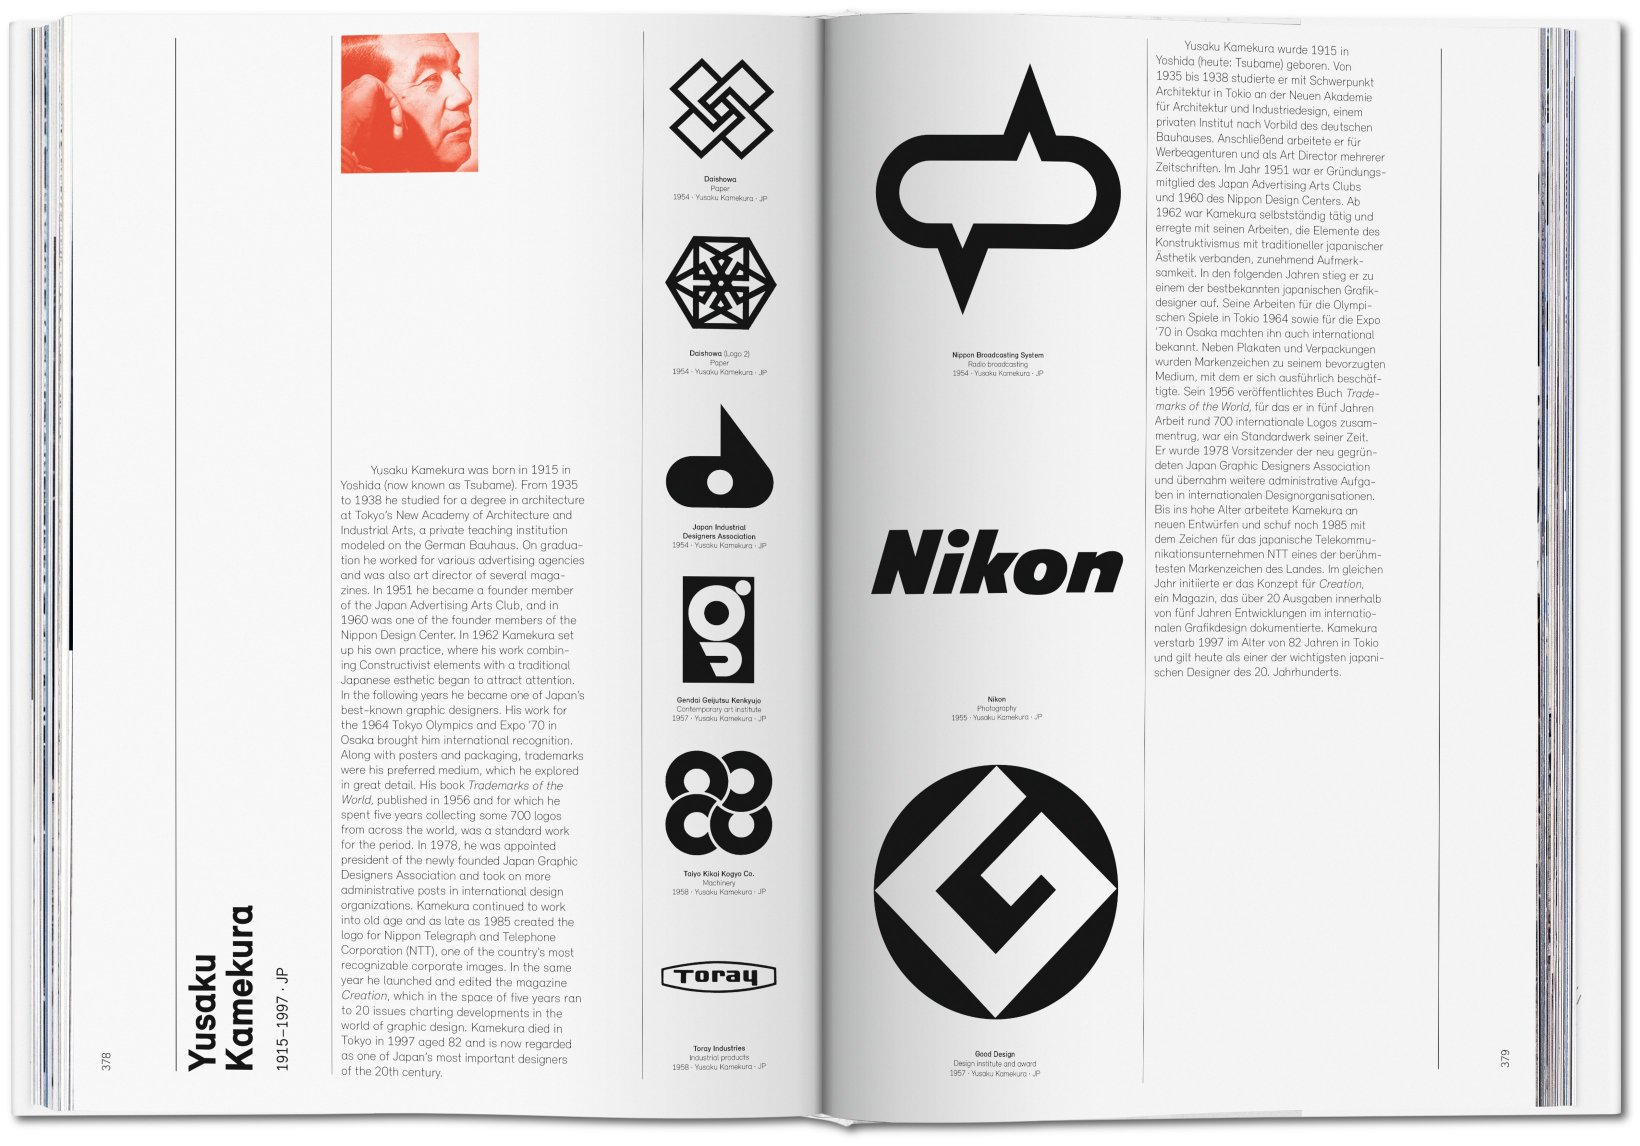 Logo Modernism, Taschen 2015